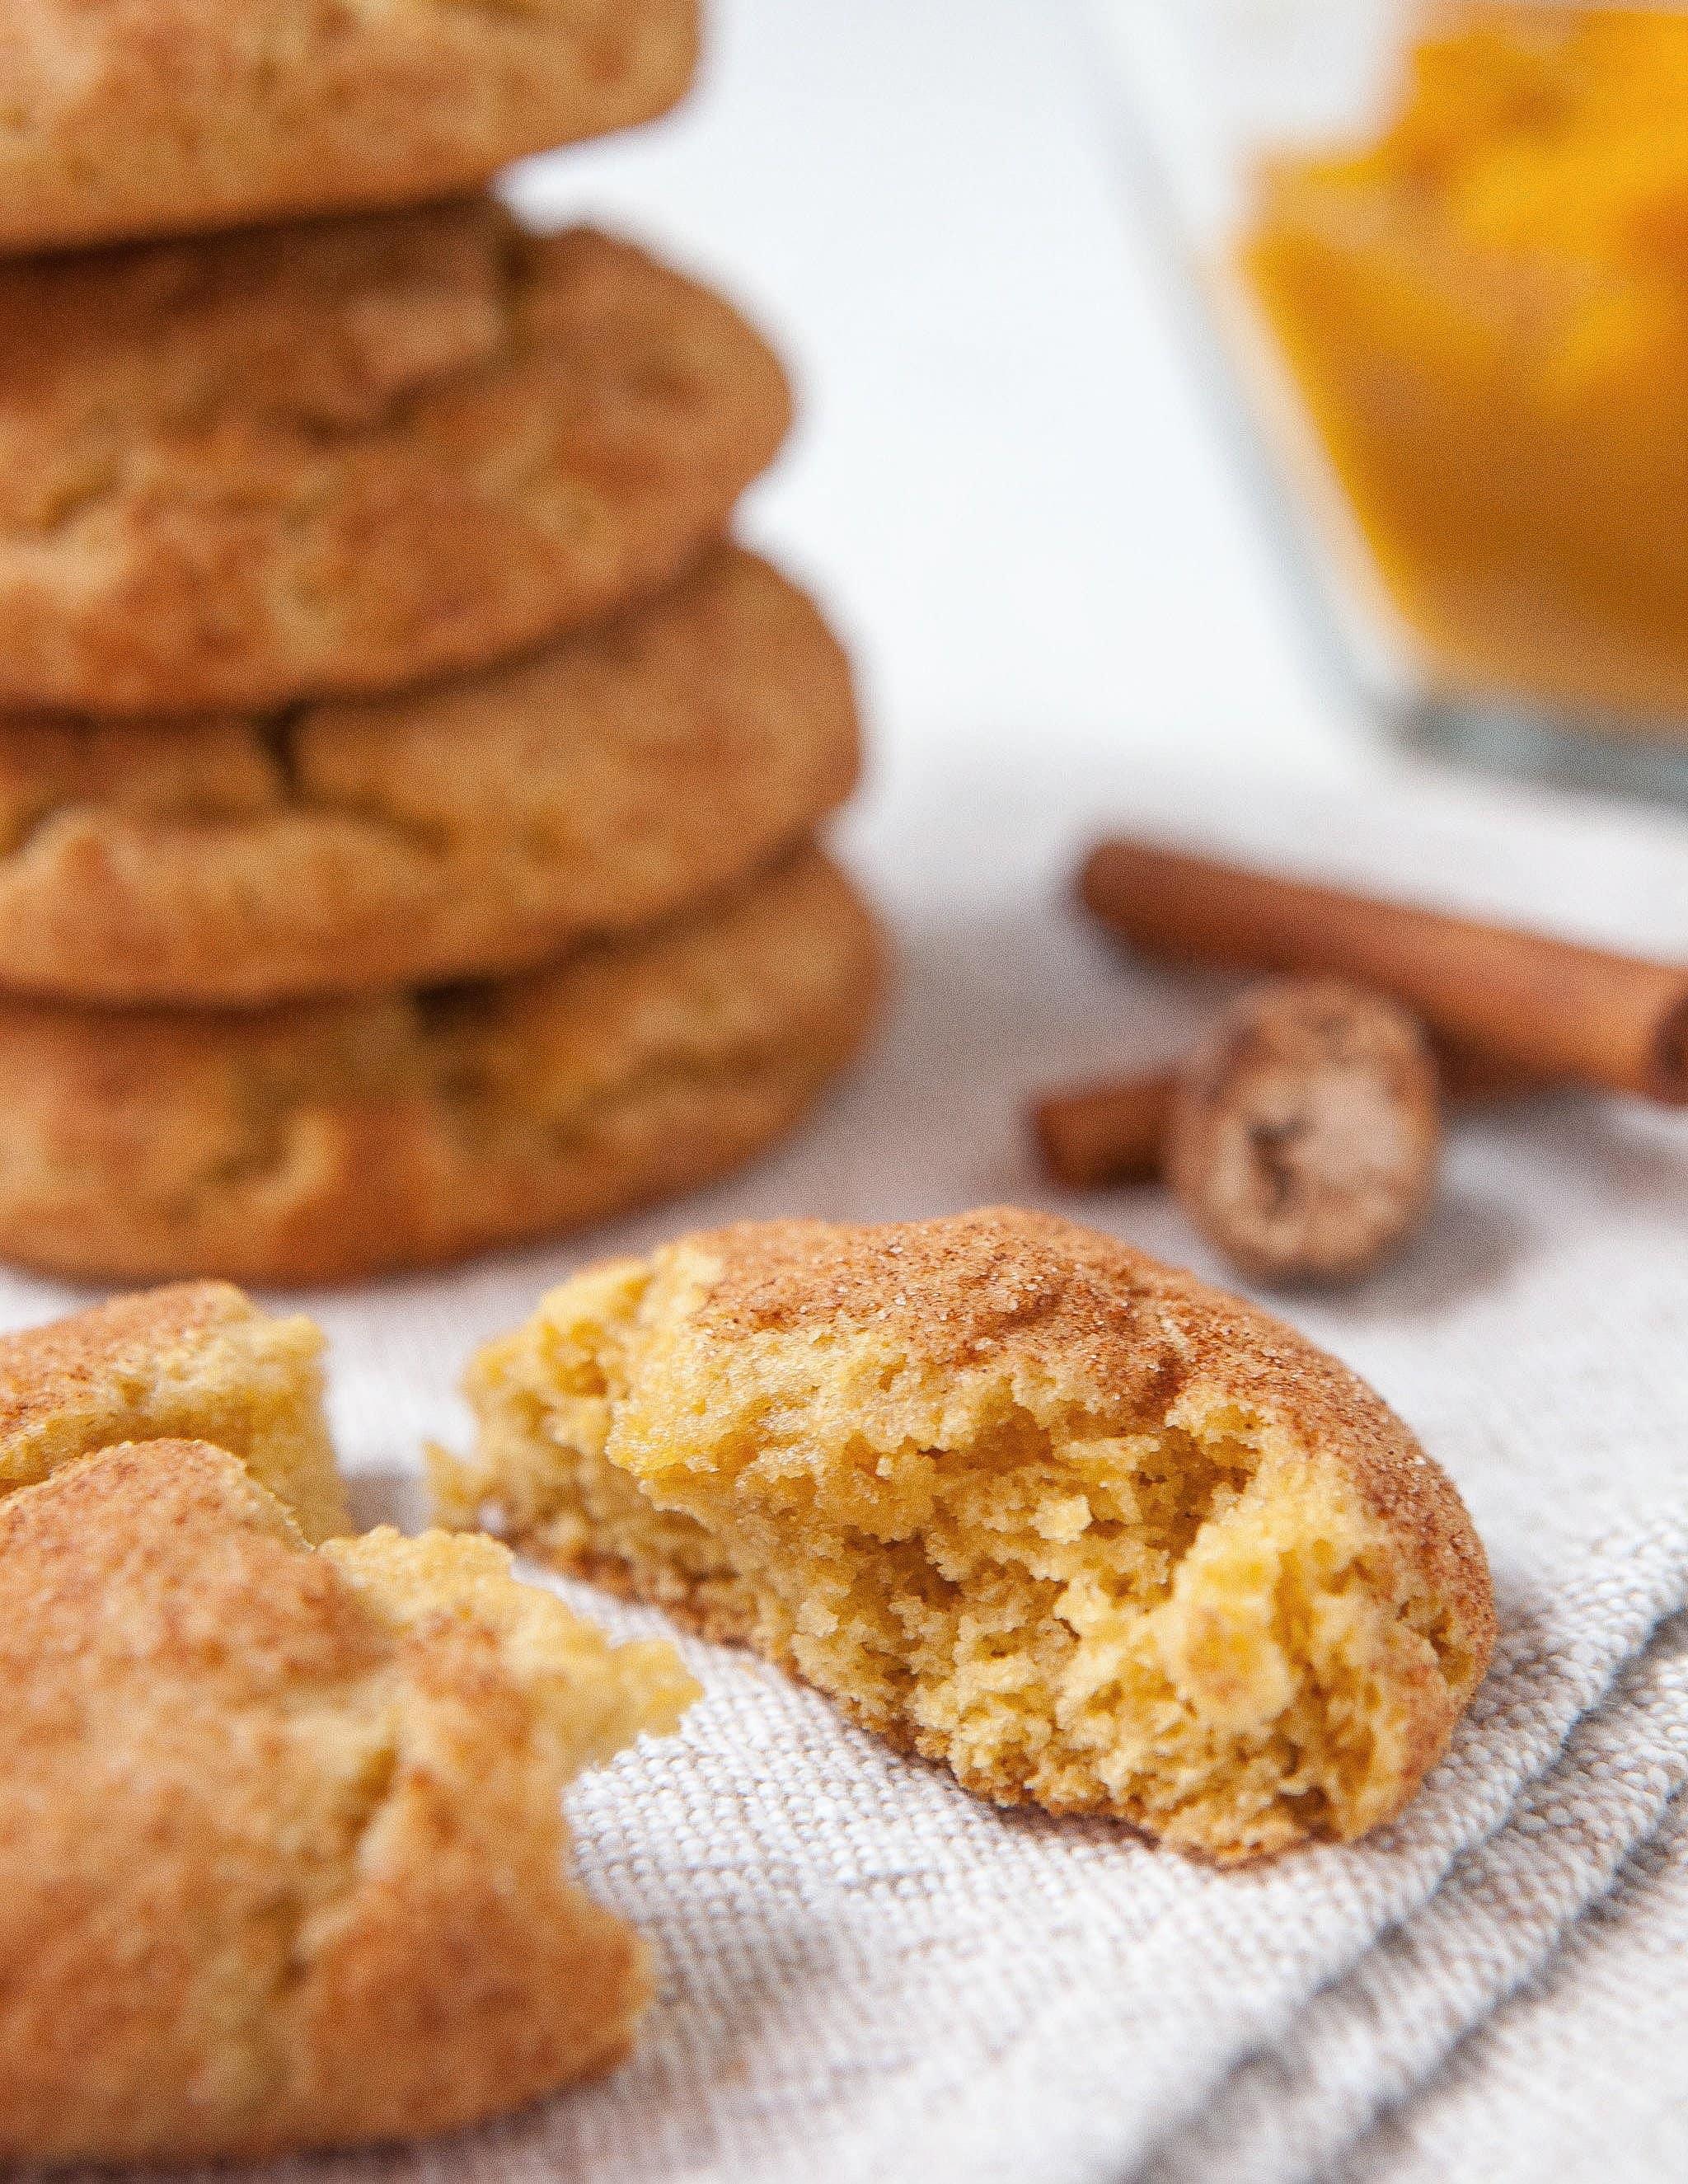 Slow Cooker Chicken Tikka Masala, Moroccan-Spiced Carrot Hummus, Baked Potato Casserole & Savory Oatmeal Cookies: gallery image 2